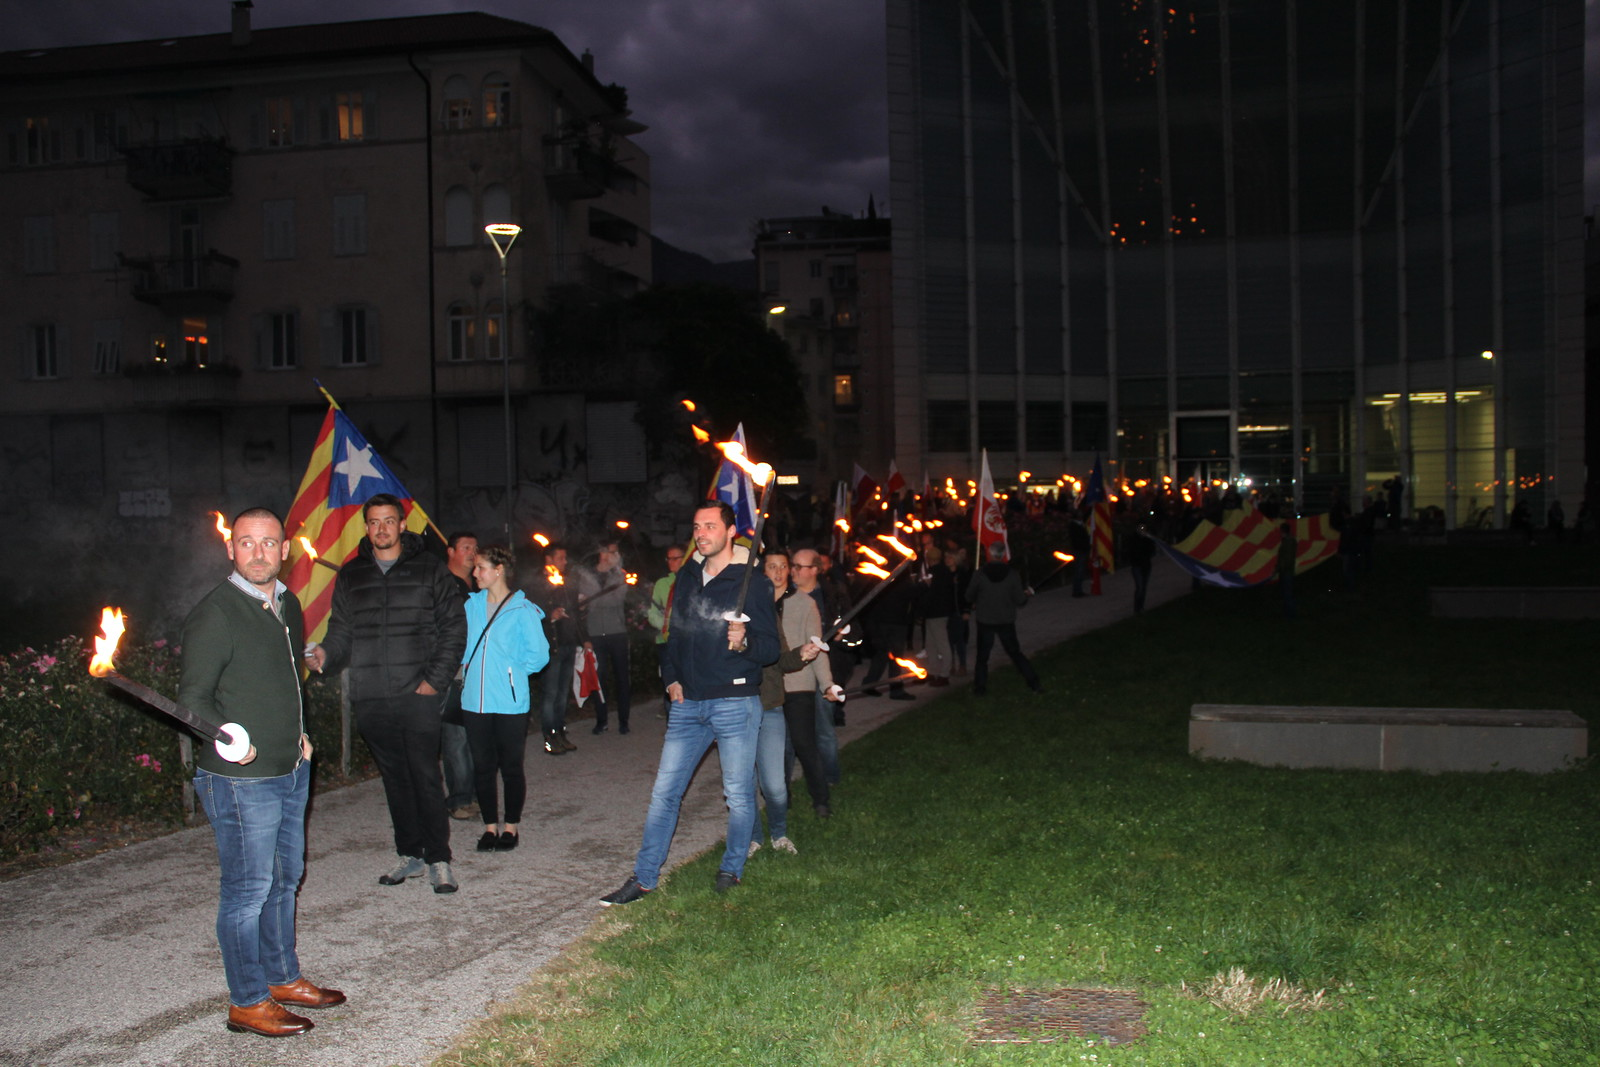 Fackelzug Katalonien in Bozen, 19.10.2019